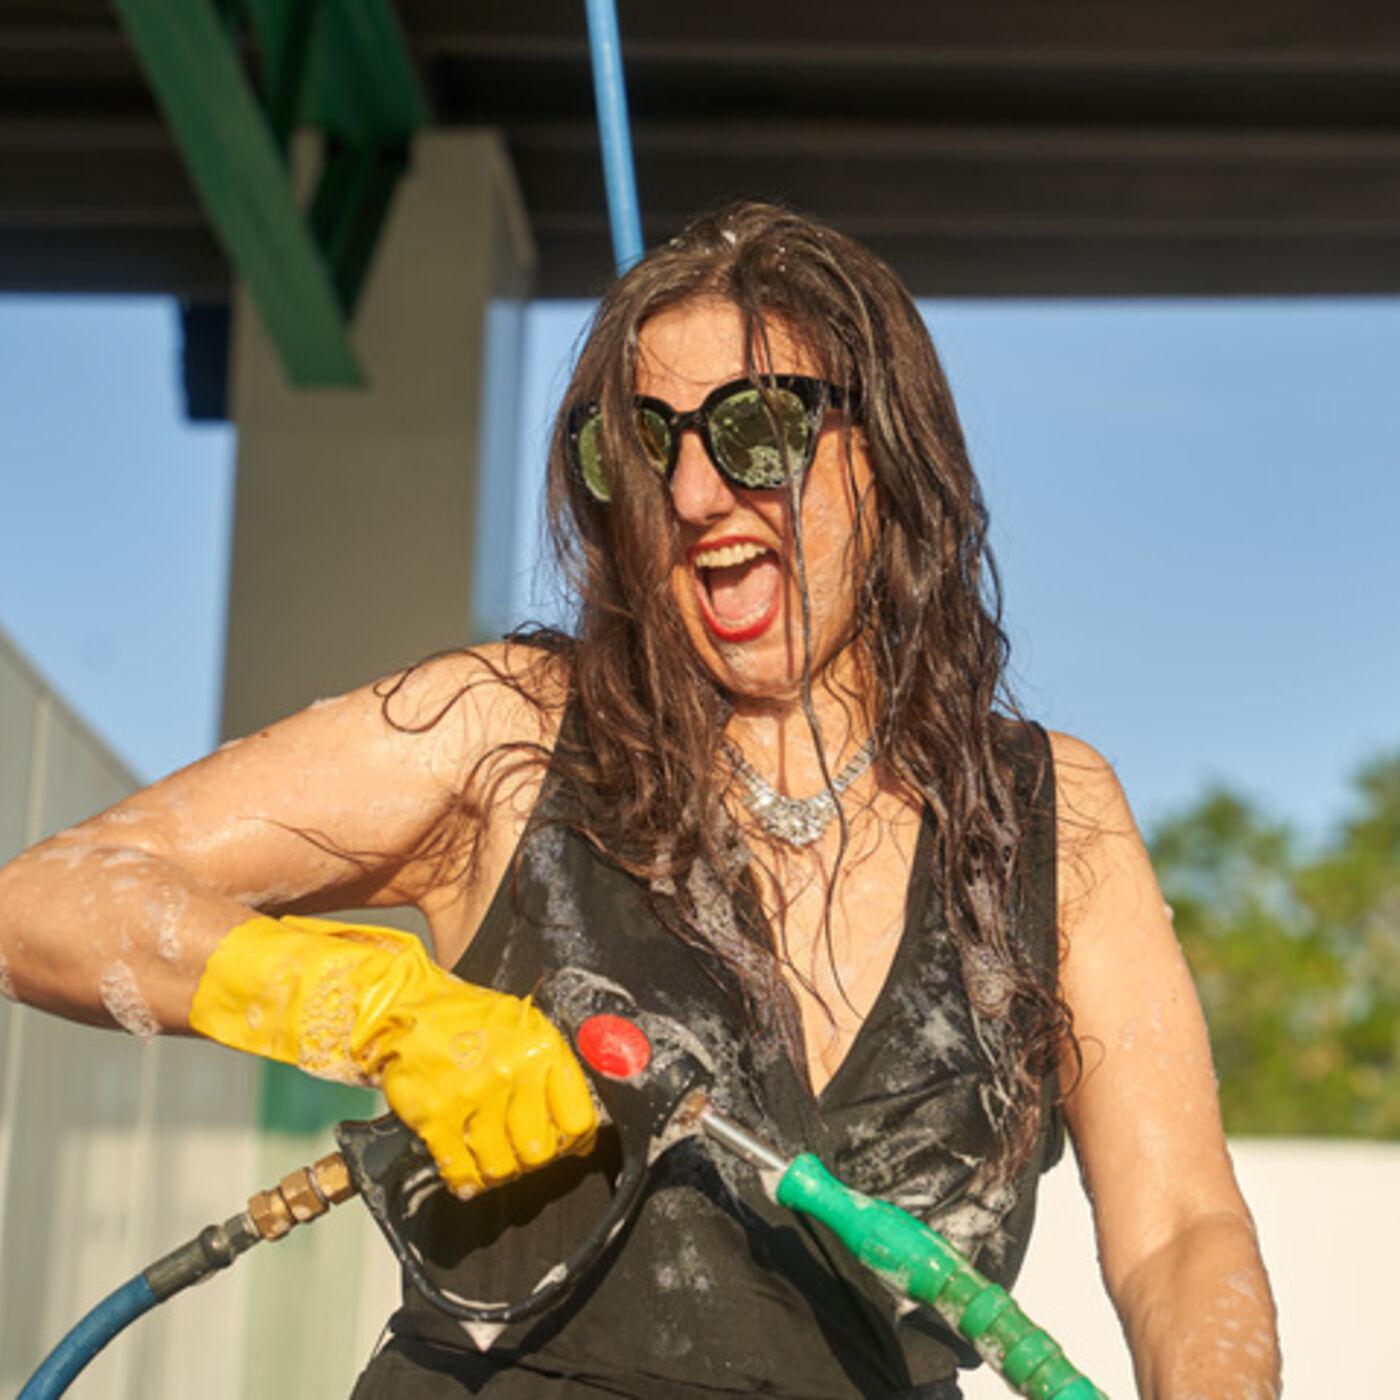 Christine Alexander, Sarasota's Laughter Facilitator, Joins the Club